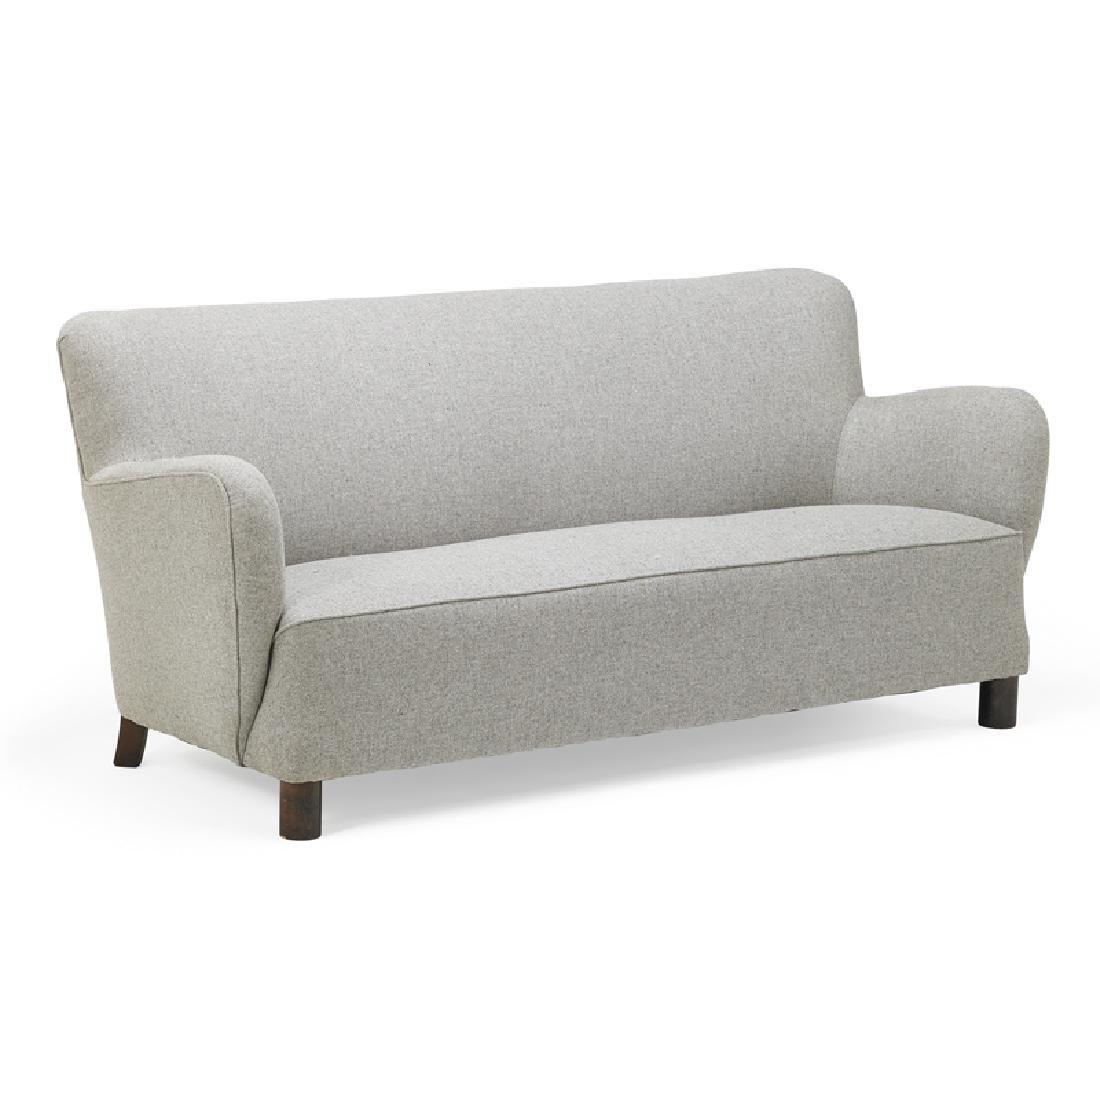 STYLE OF FLEMMING LASSEN Sofa